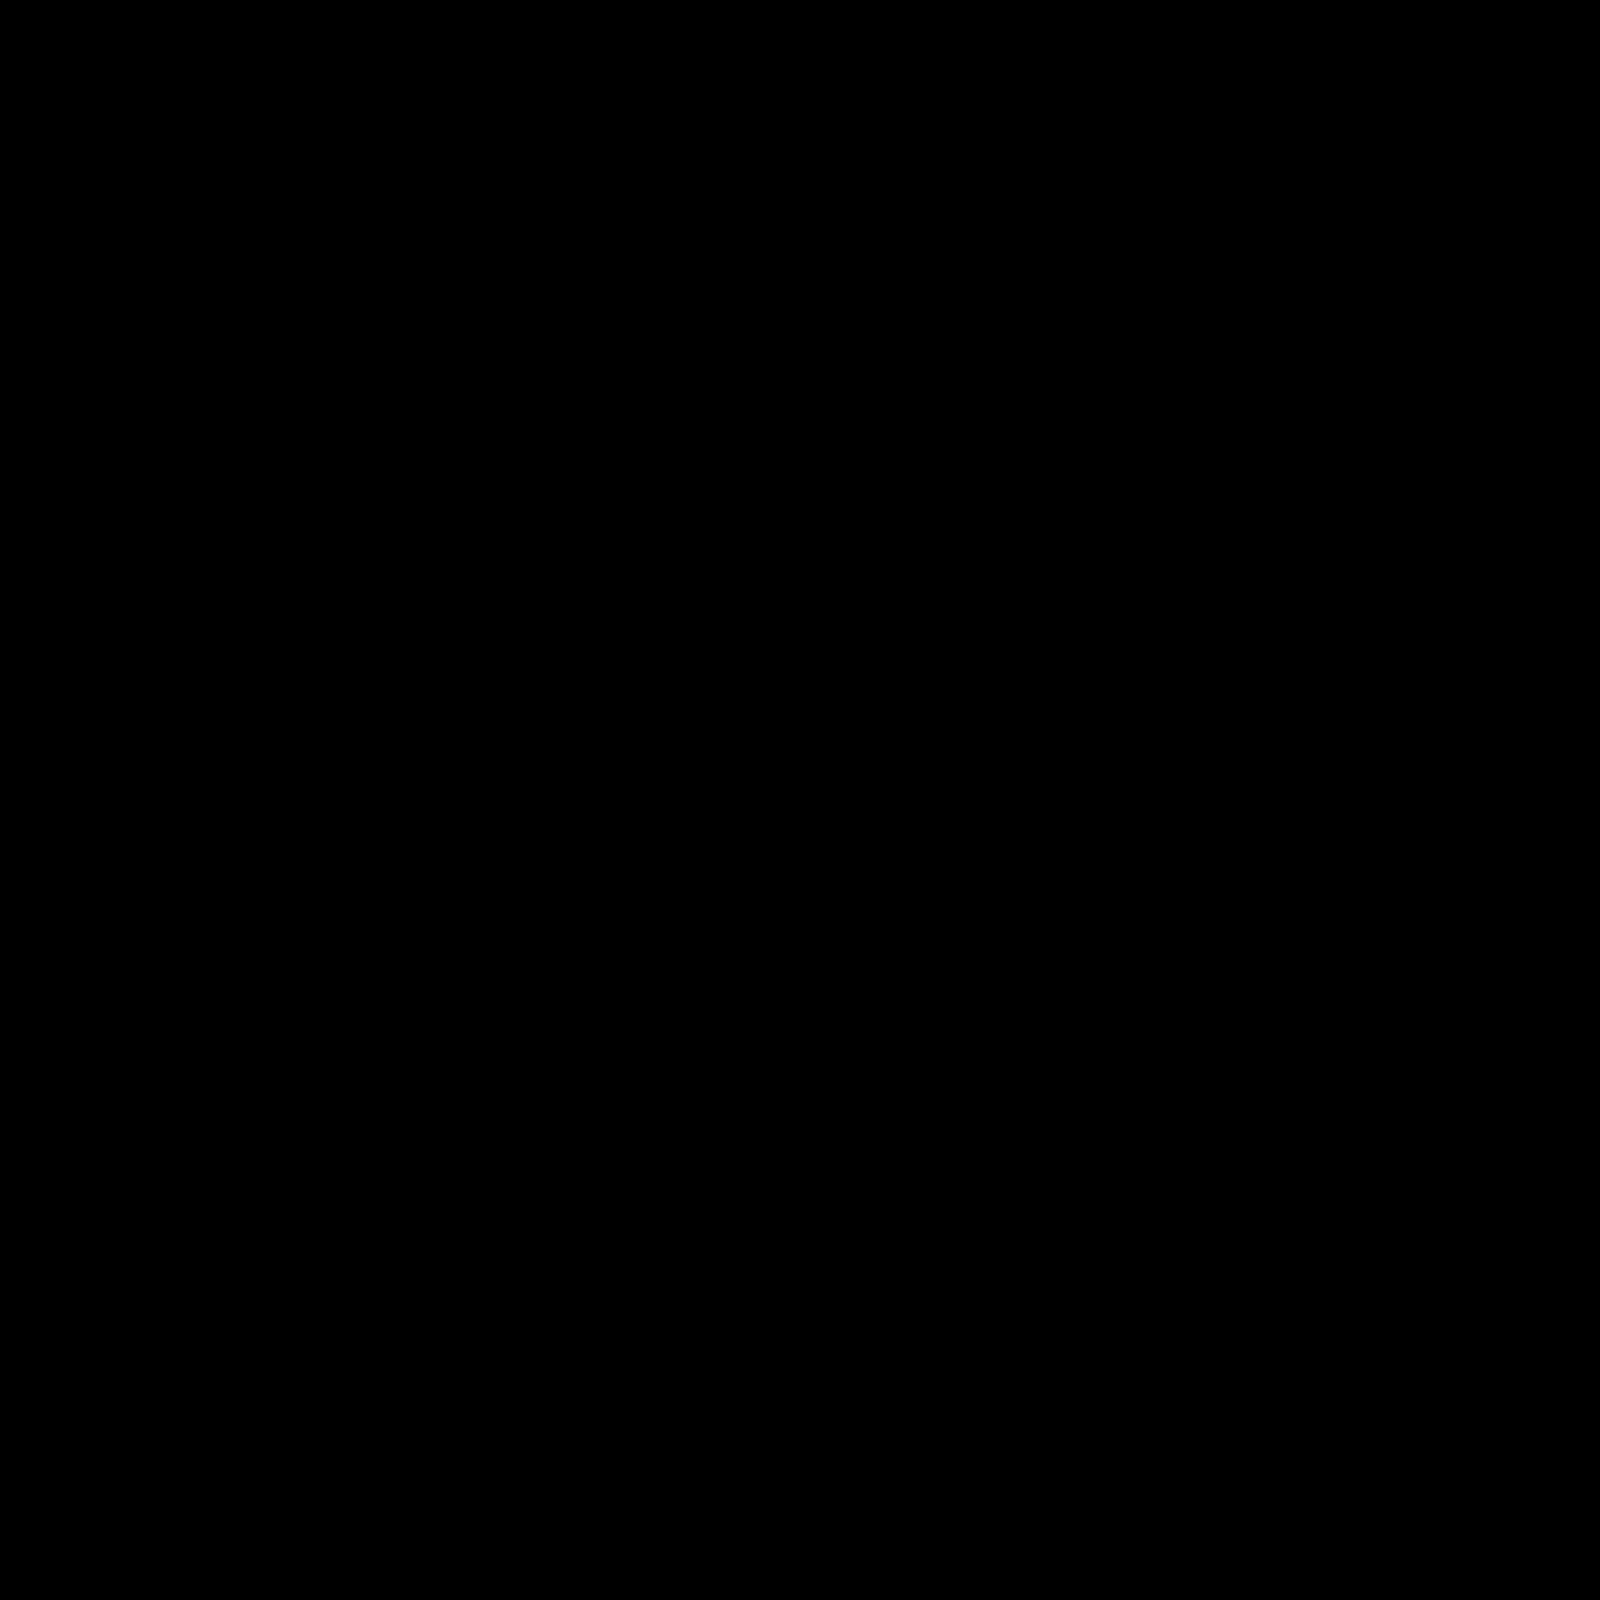 Stück Würfelzucker icon